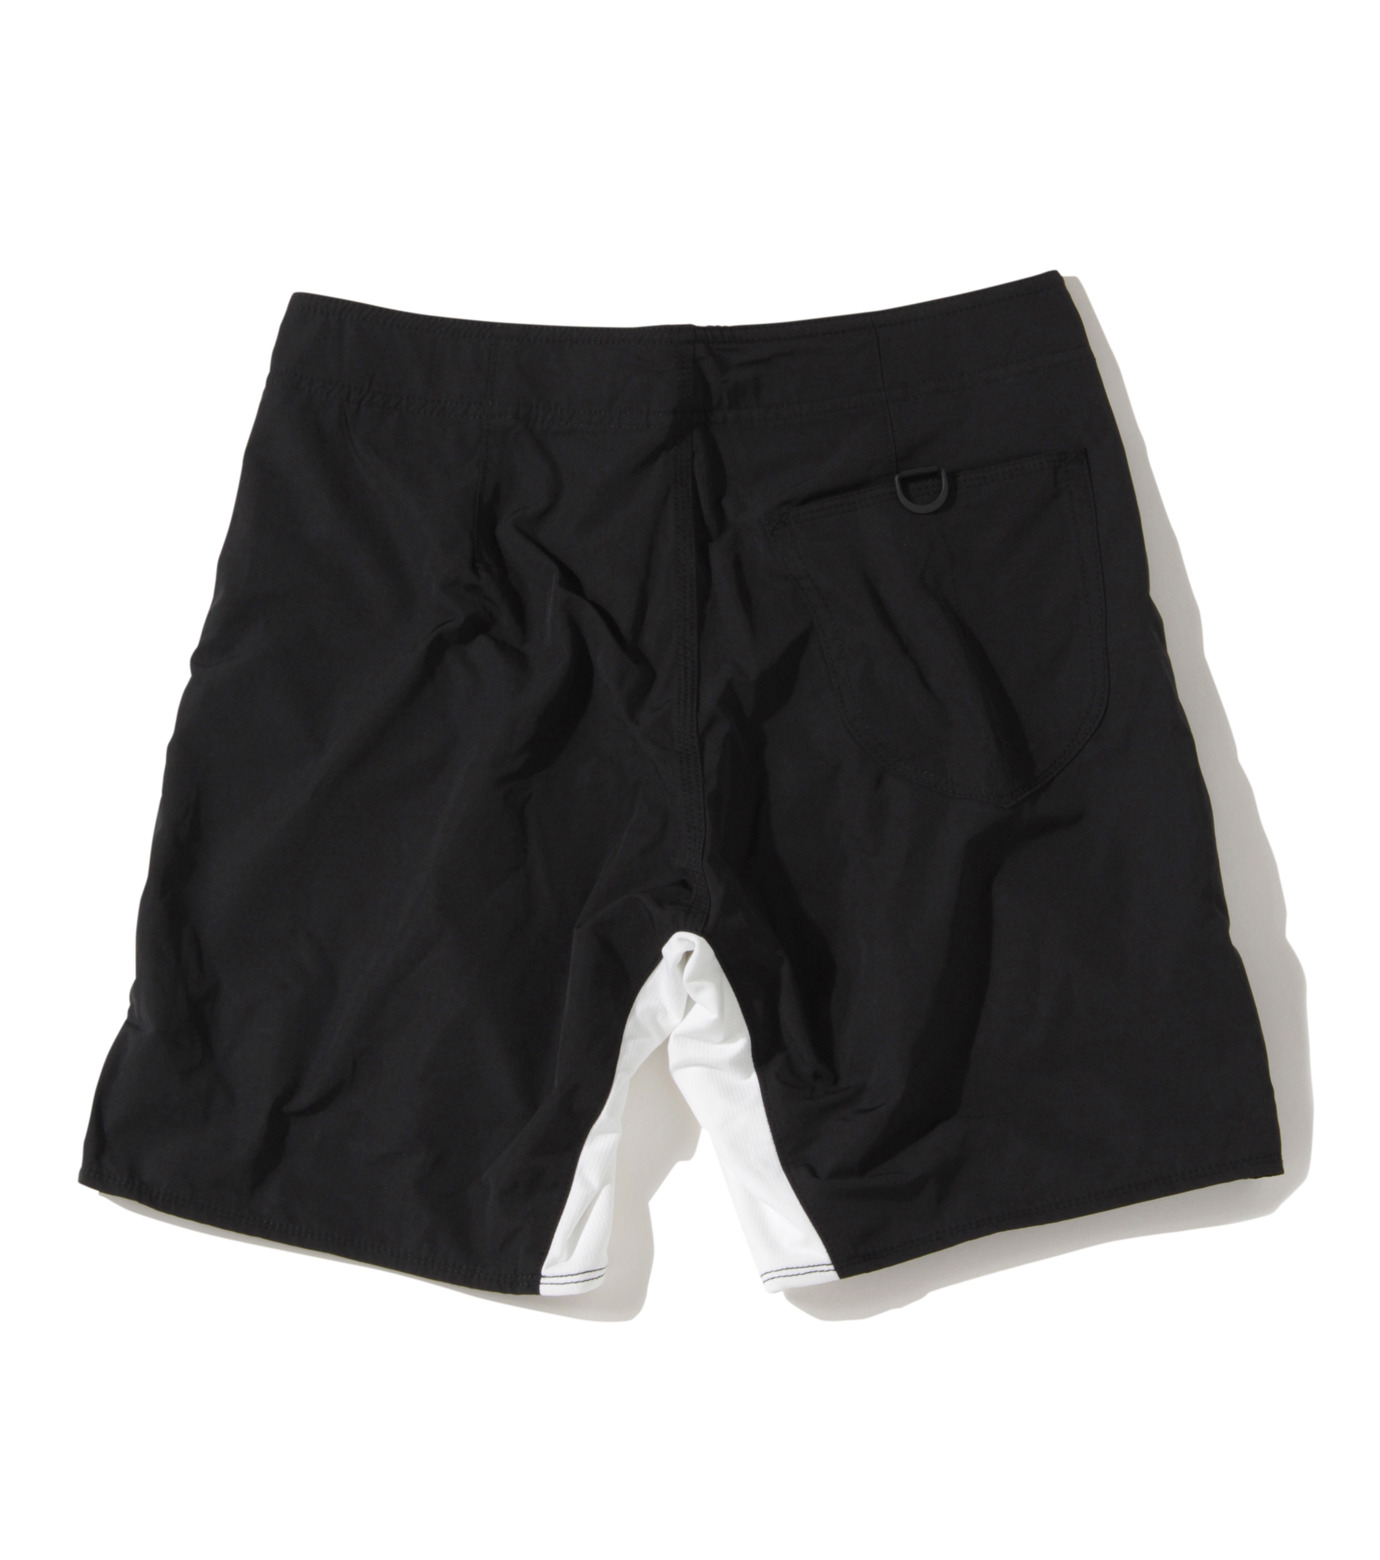 TWO TWO ONE(トゥートゥーワン)のSurf shorts short-WHITE(SWIMWEAR/SWIMWEAR)-15N948001-4 拡大詳細画像2